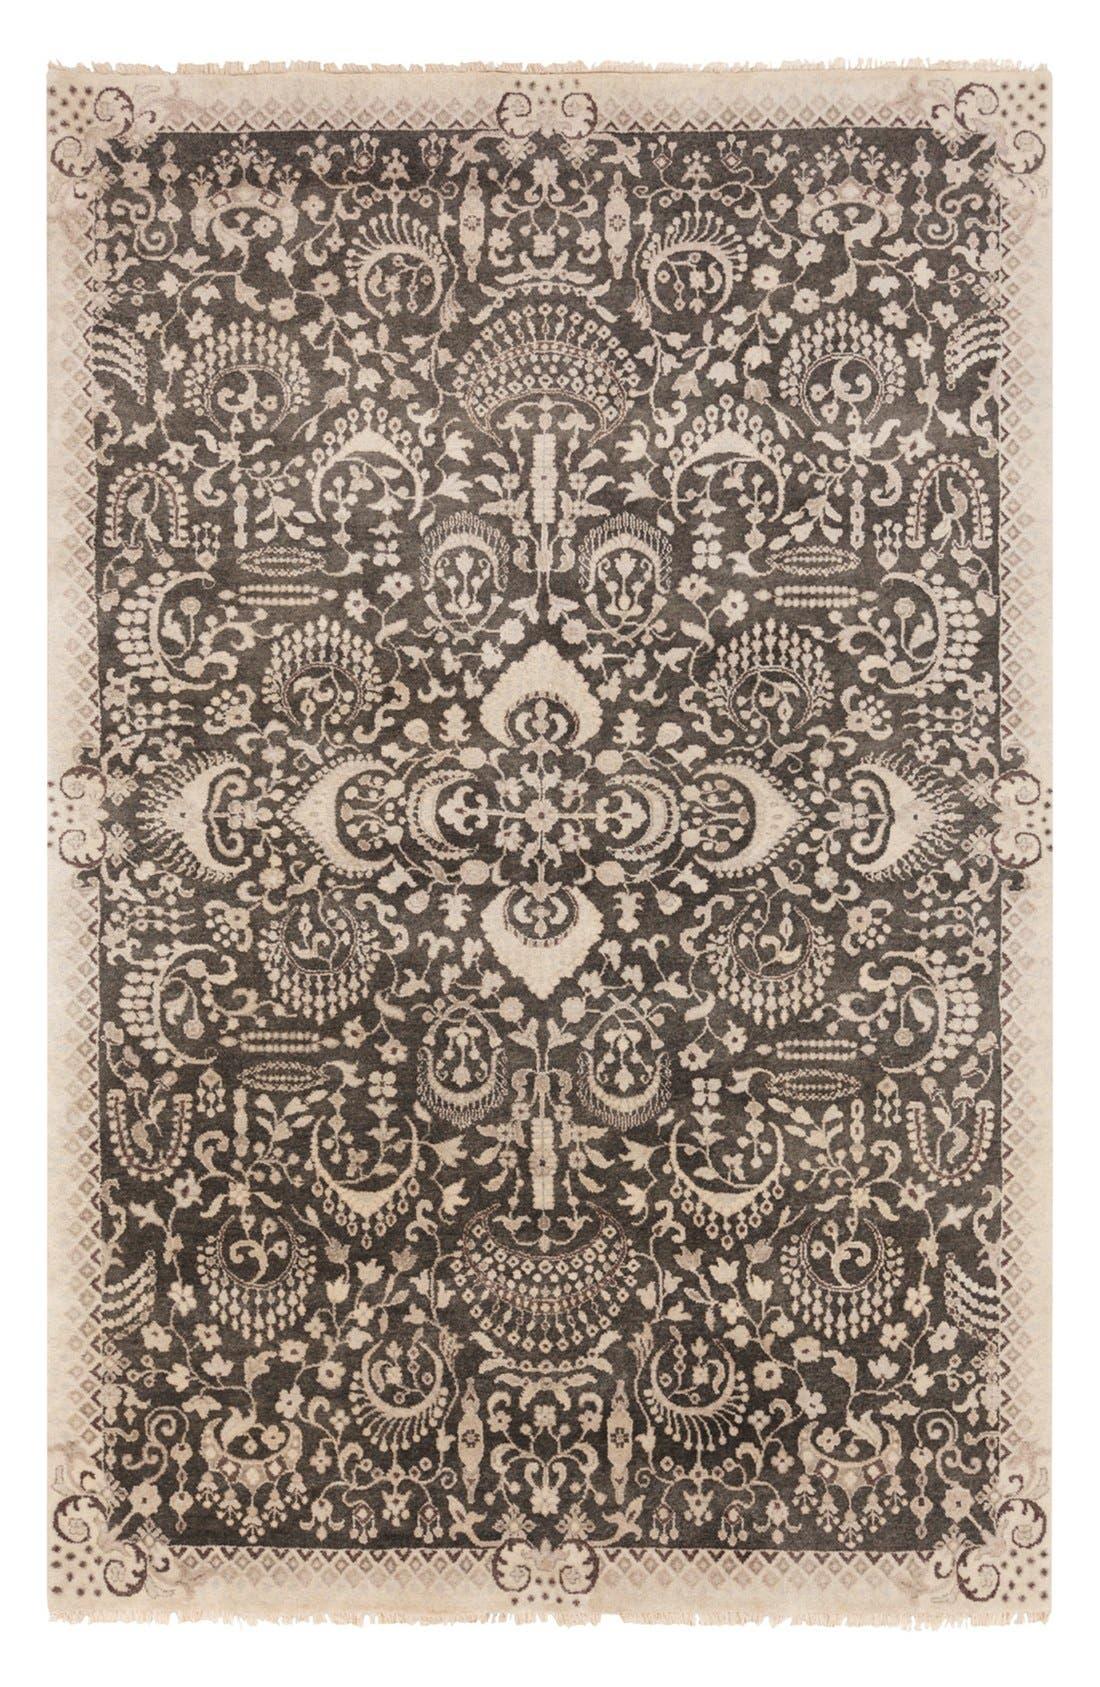 'Empress' Wool Rug,                         Main,                         color, Ivory/ Black Multi